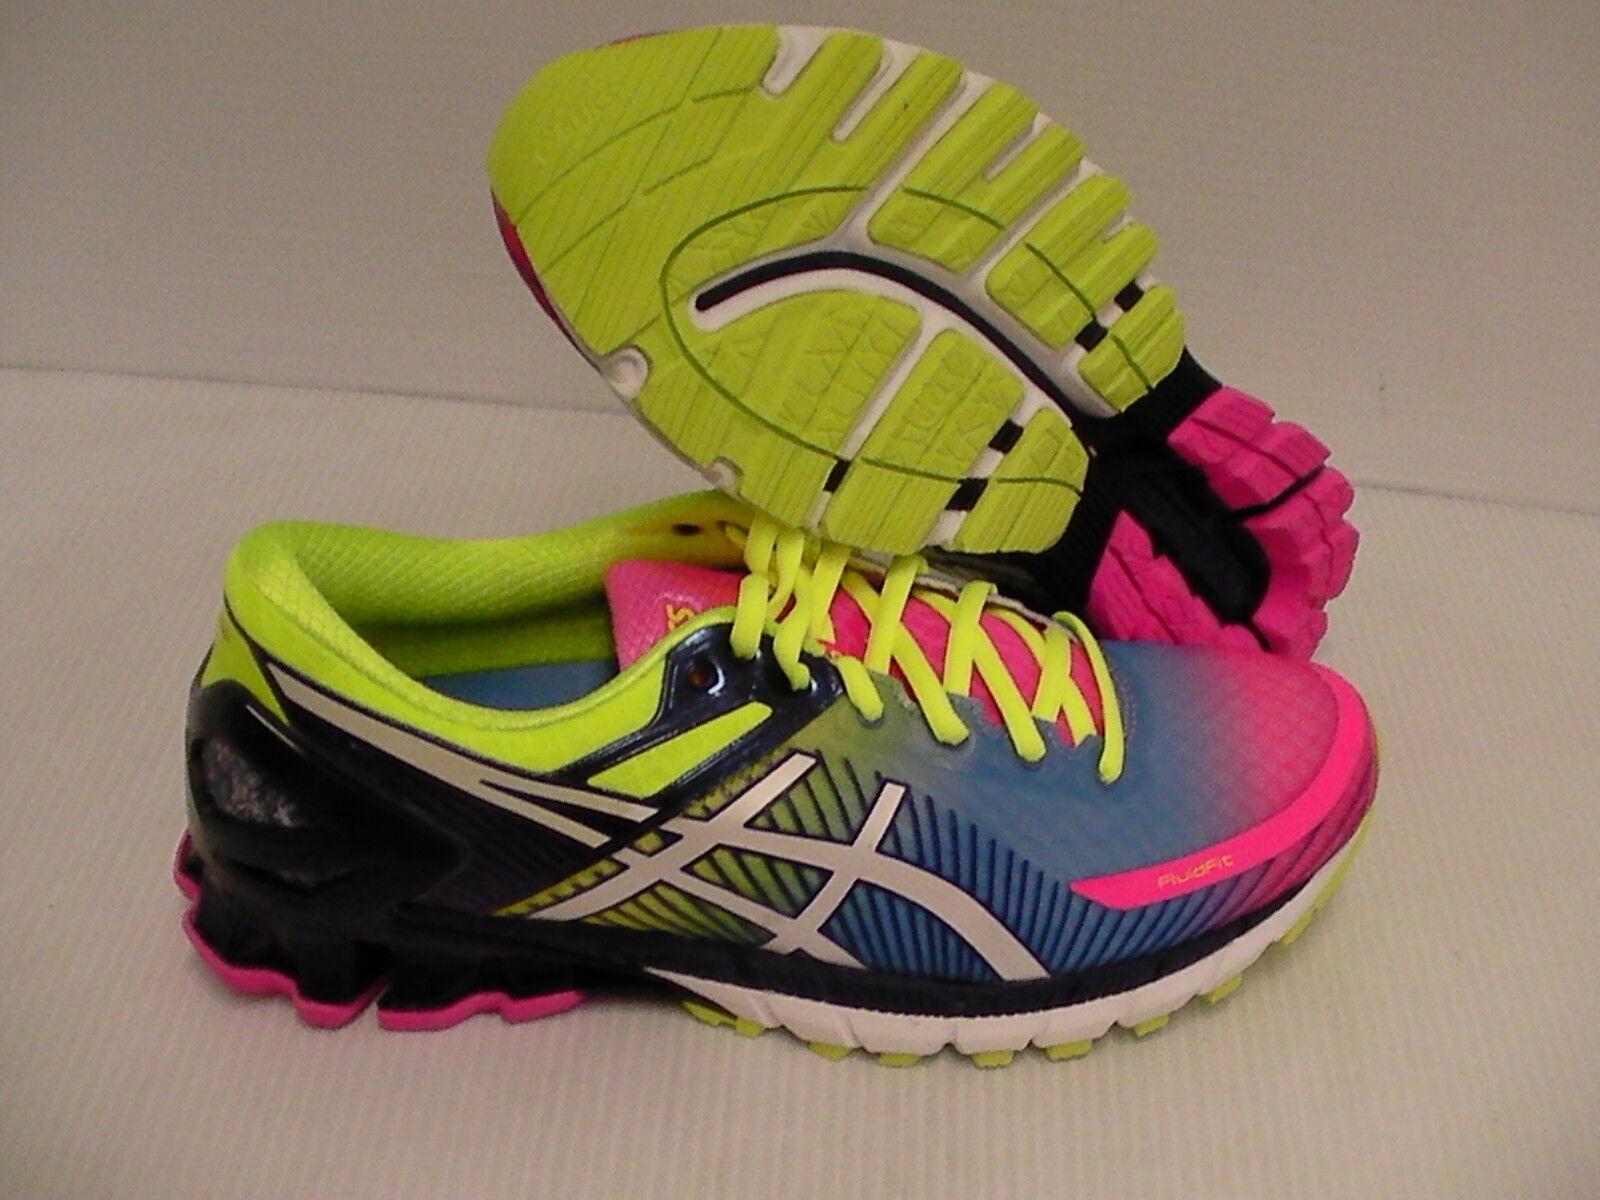 Asics femmes  running  chaussures  gel kinsei 6 hot rose  Blanc  flash yellow Taille 12